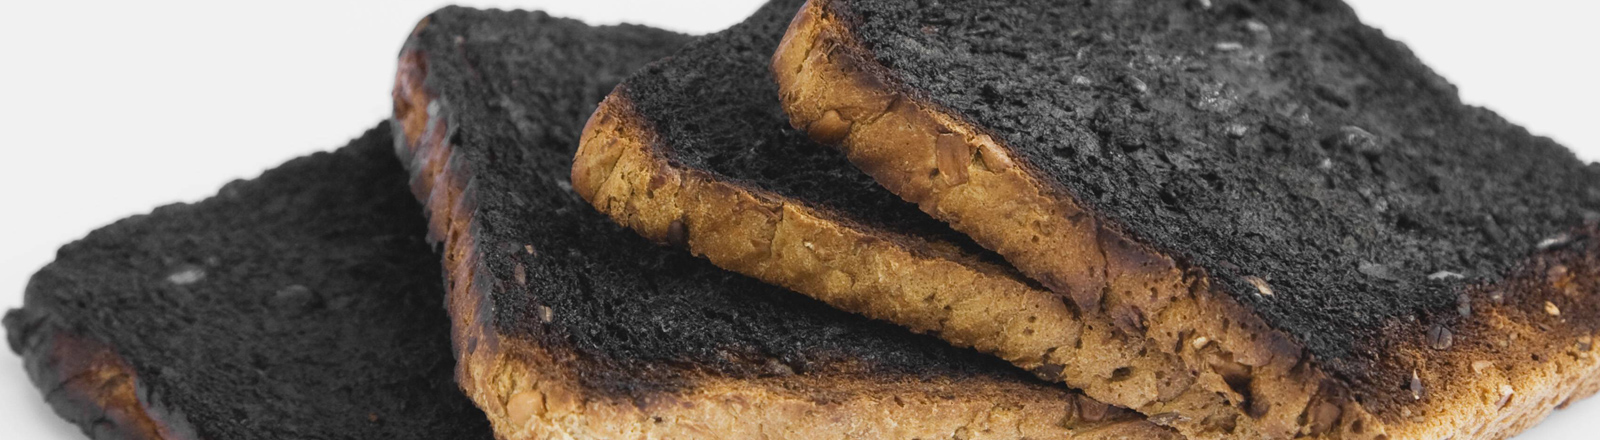 Verkohltes, verbranntes Brot